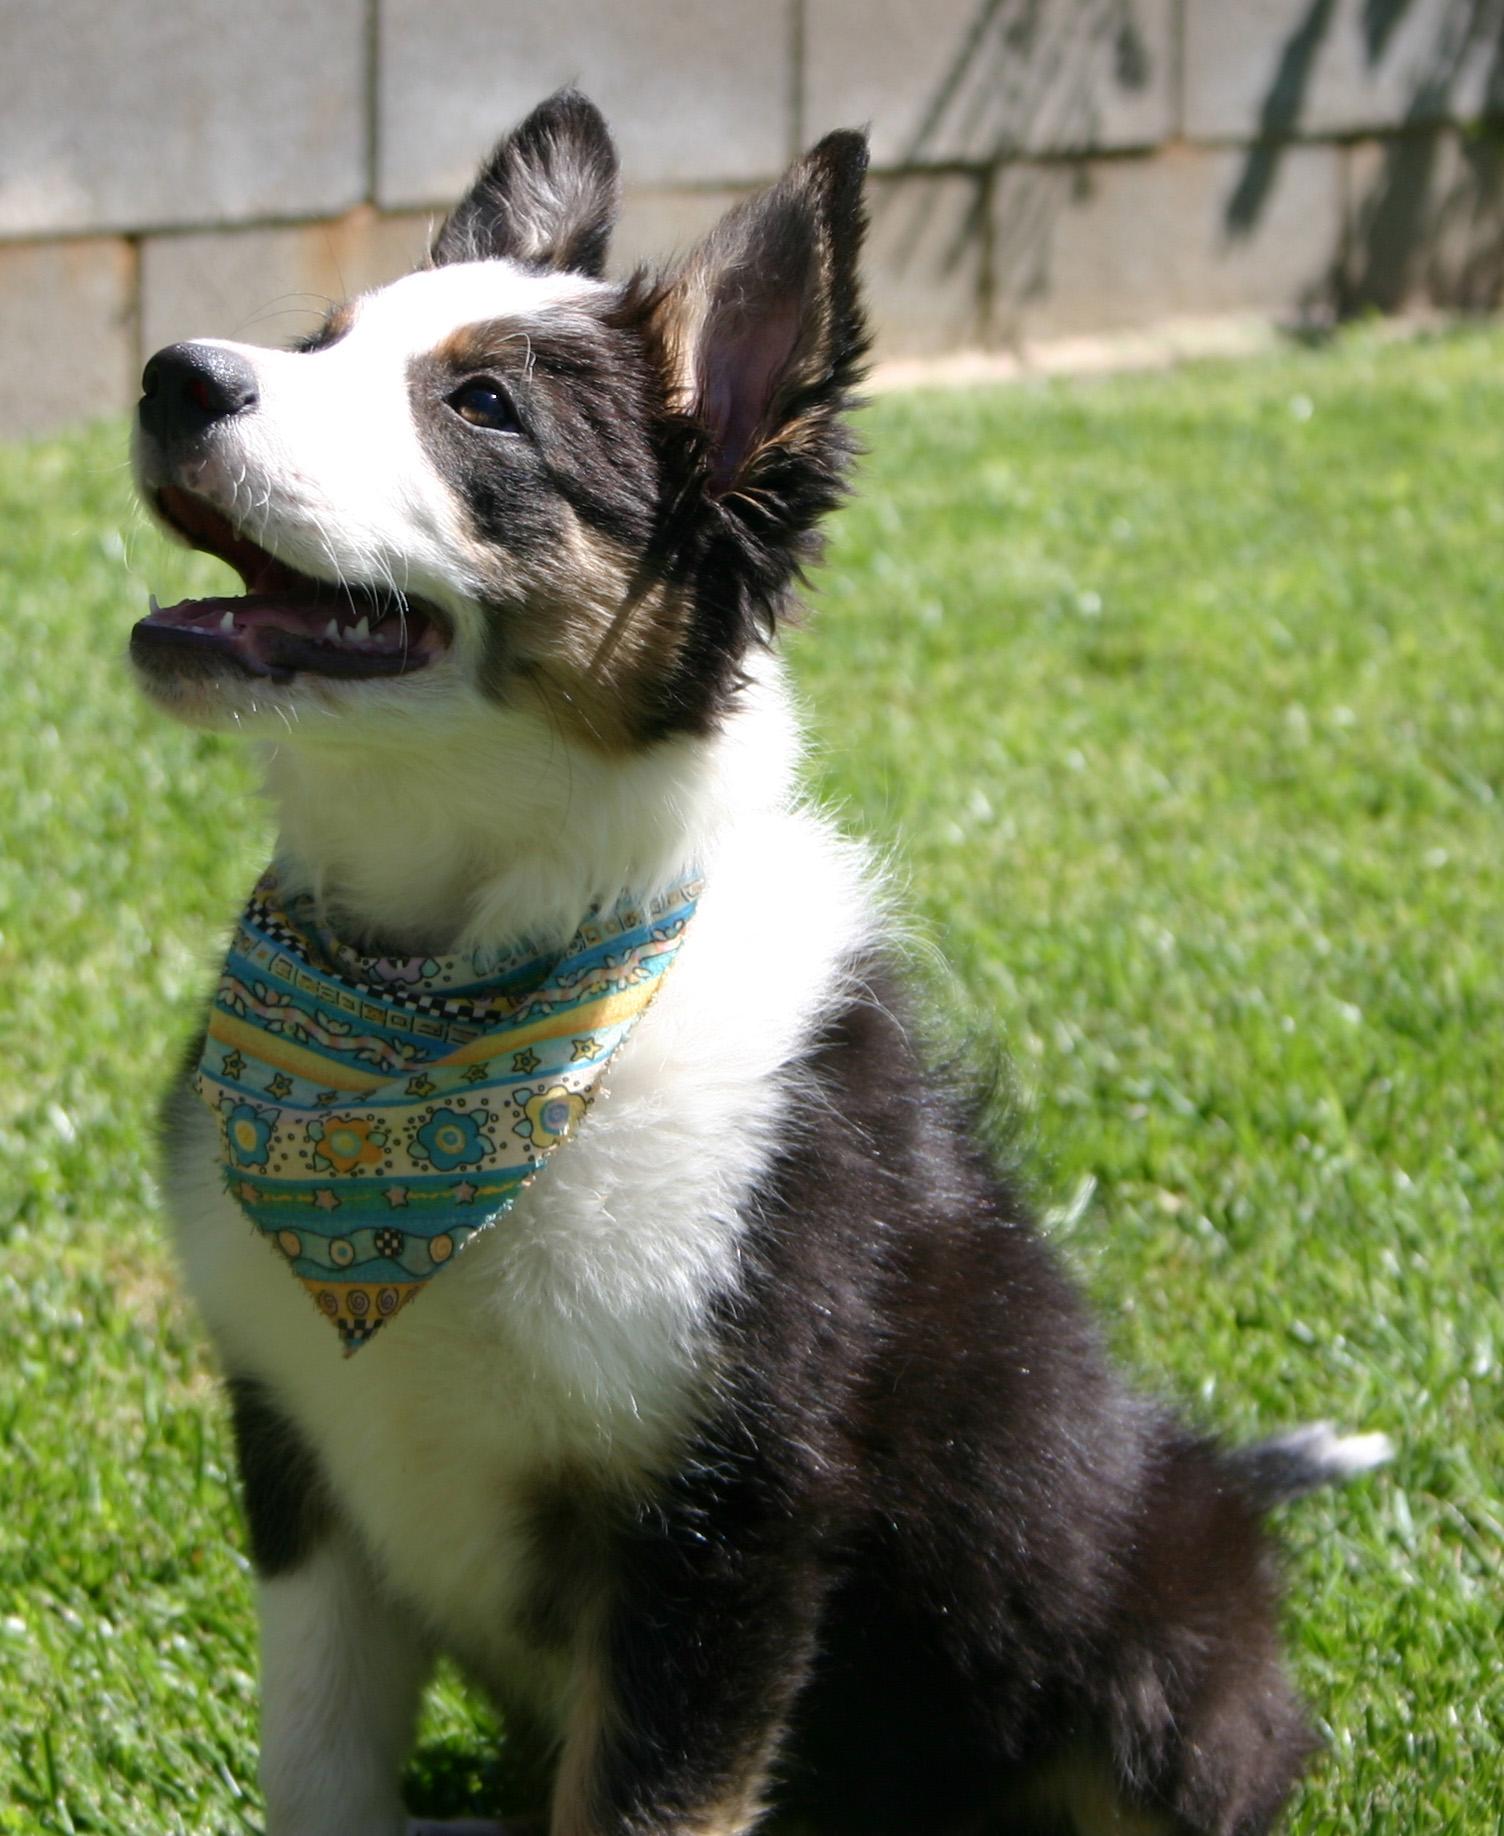 Australian Shepherd cross, mouth open, looking longingly up at her handler